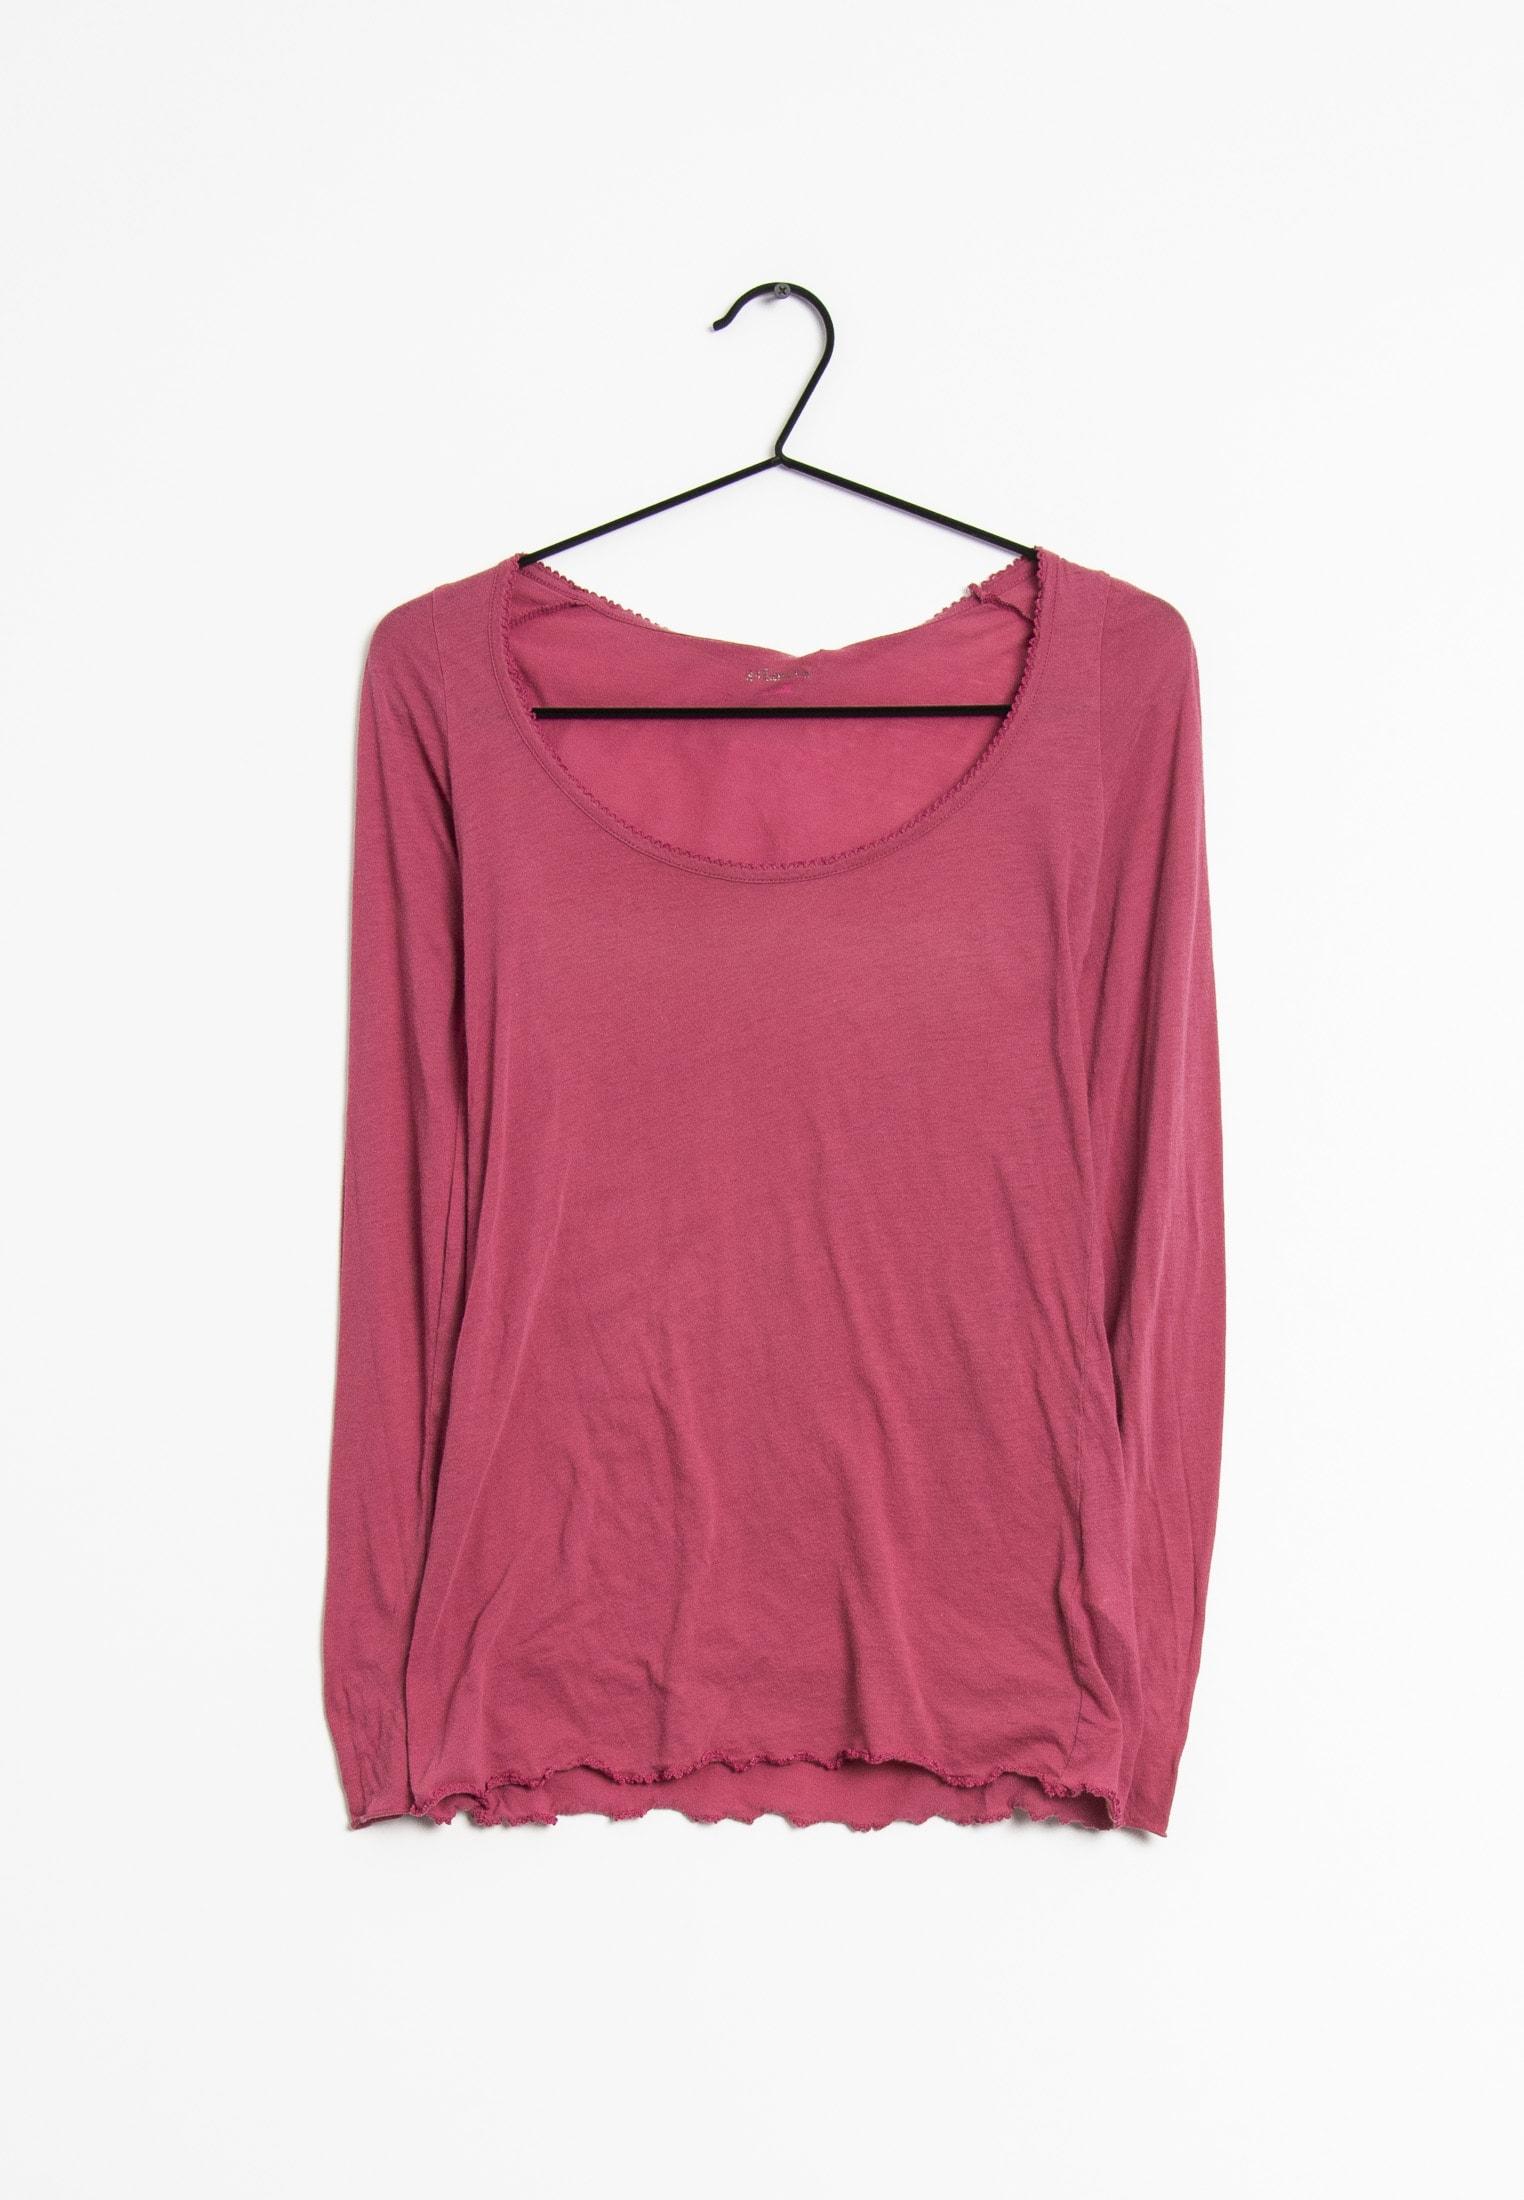 81hours Langarmshirt Pink Gr.S